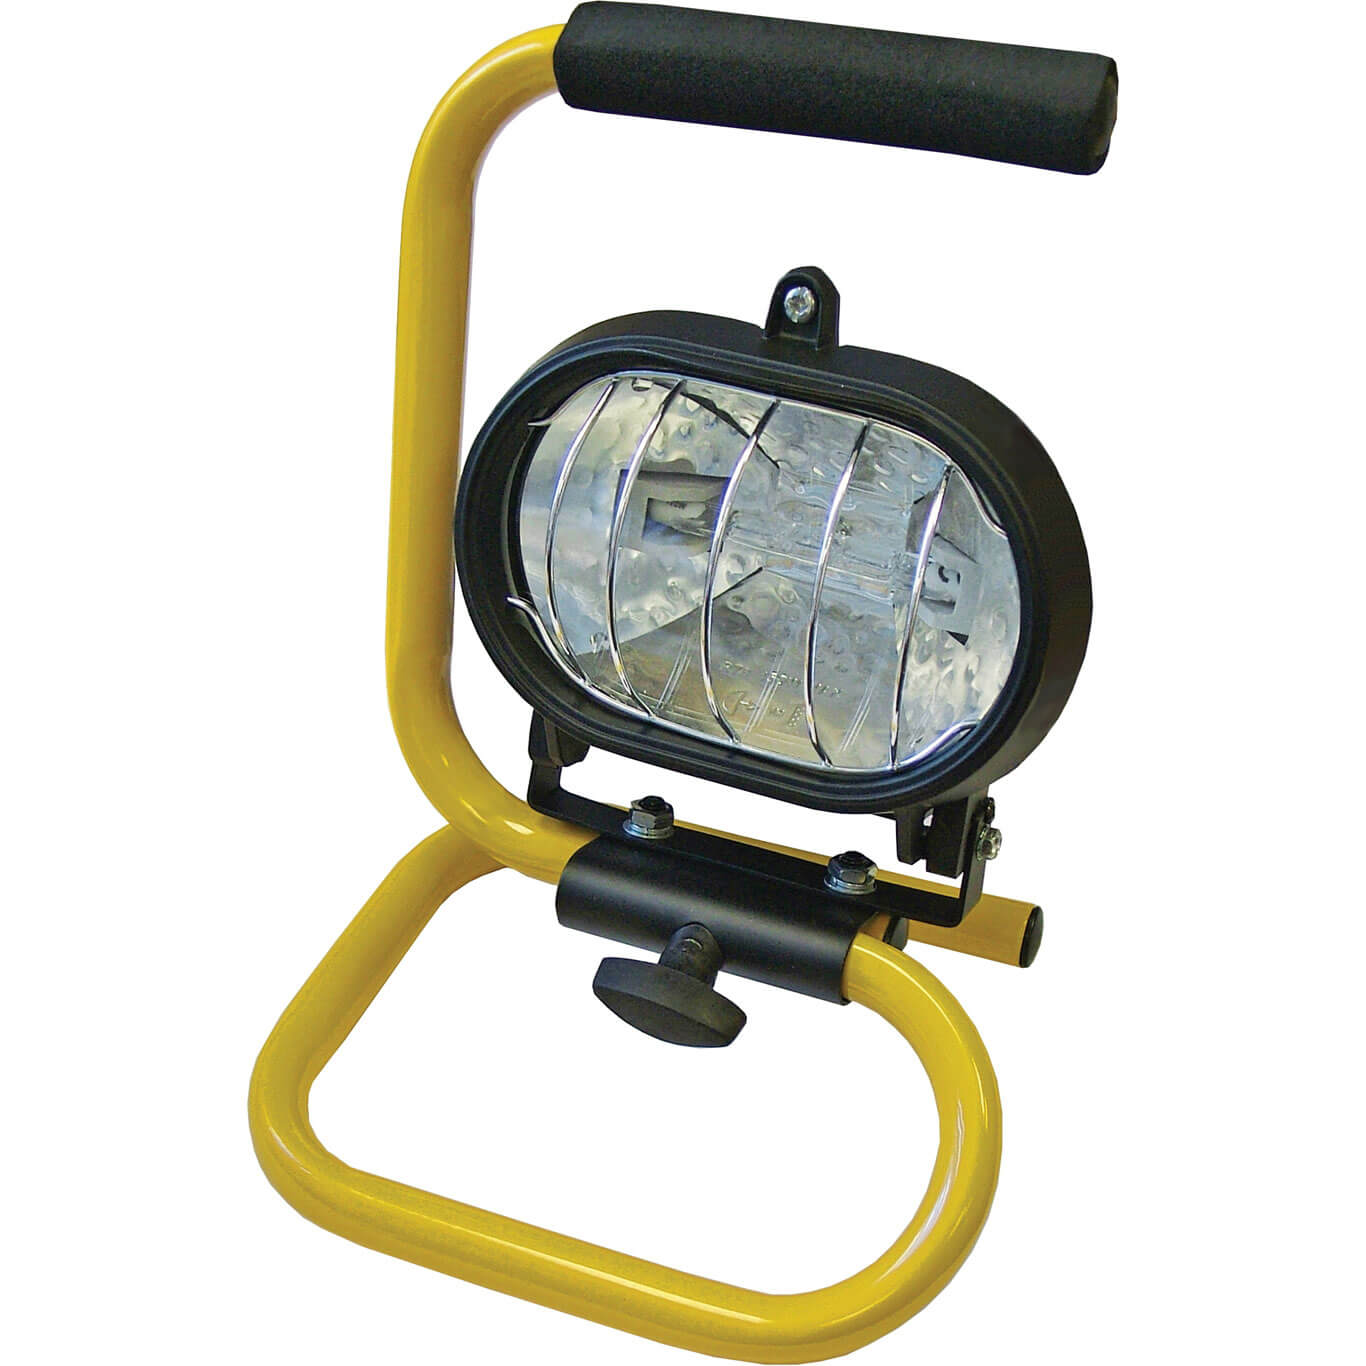 Halogen Work Lamp Flood Light 150w Portable Garage: Faithfull 150w Portable Halogen Site Light